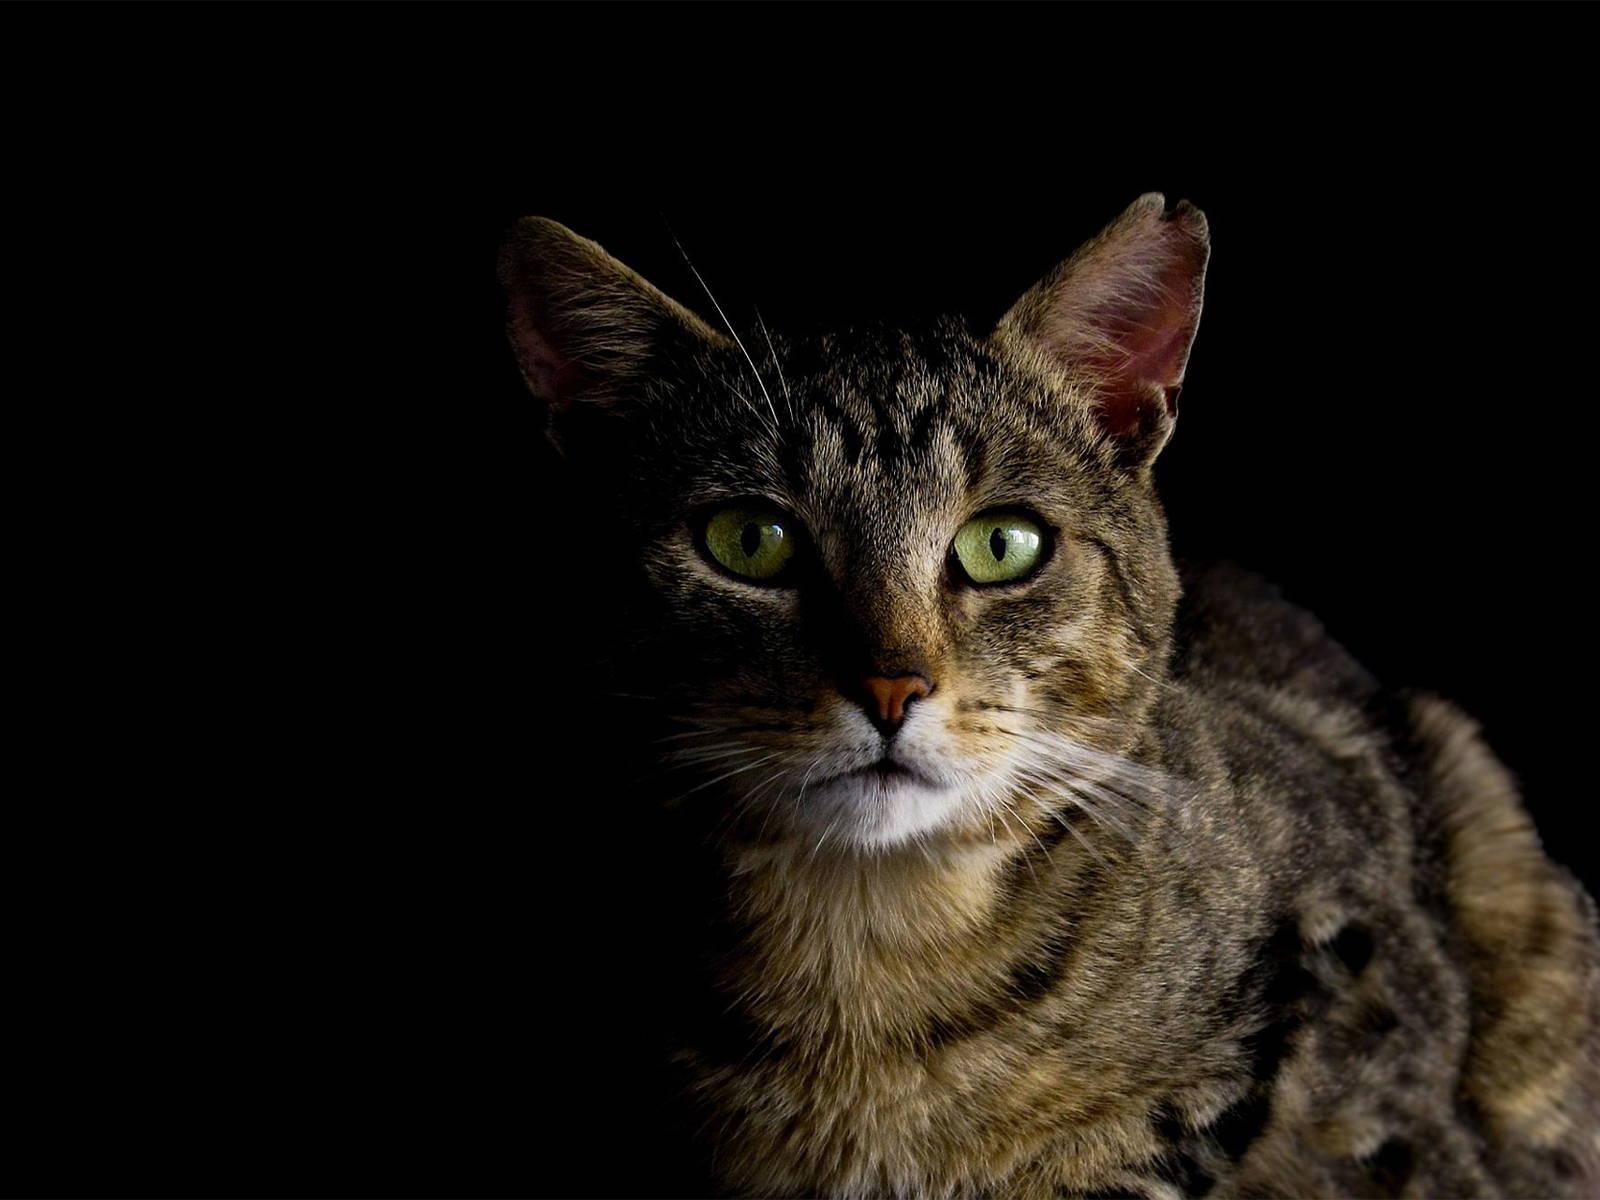 Katze miaut nachts Header